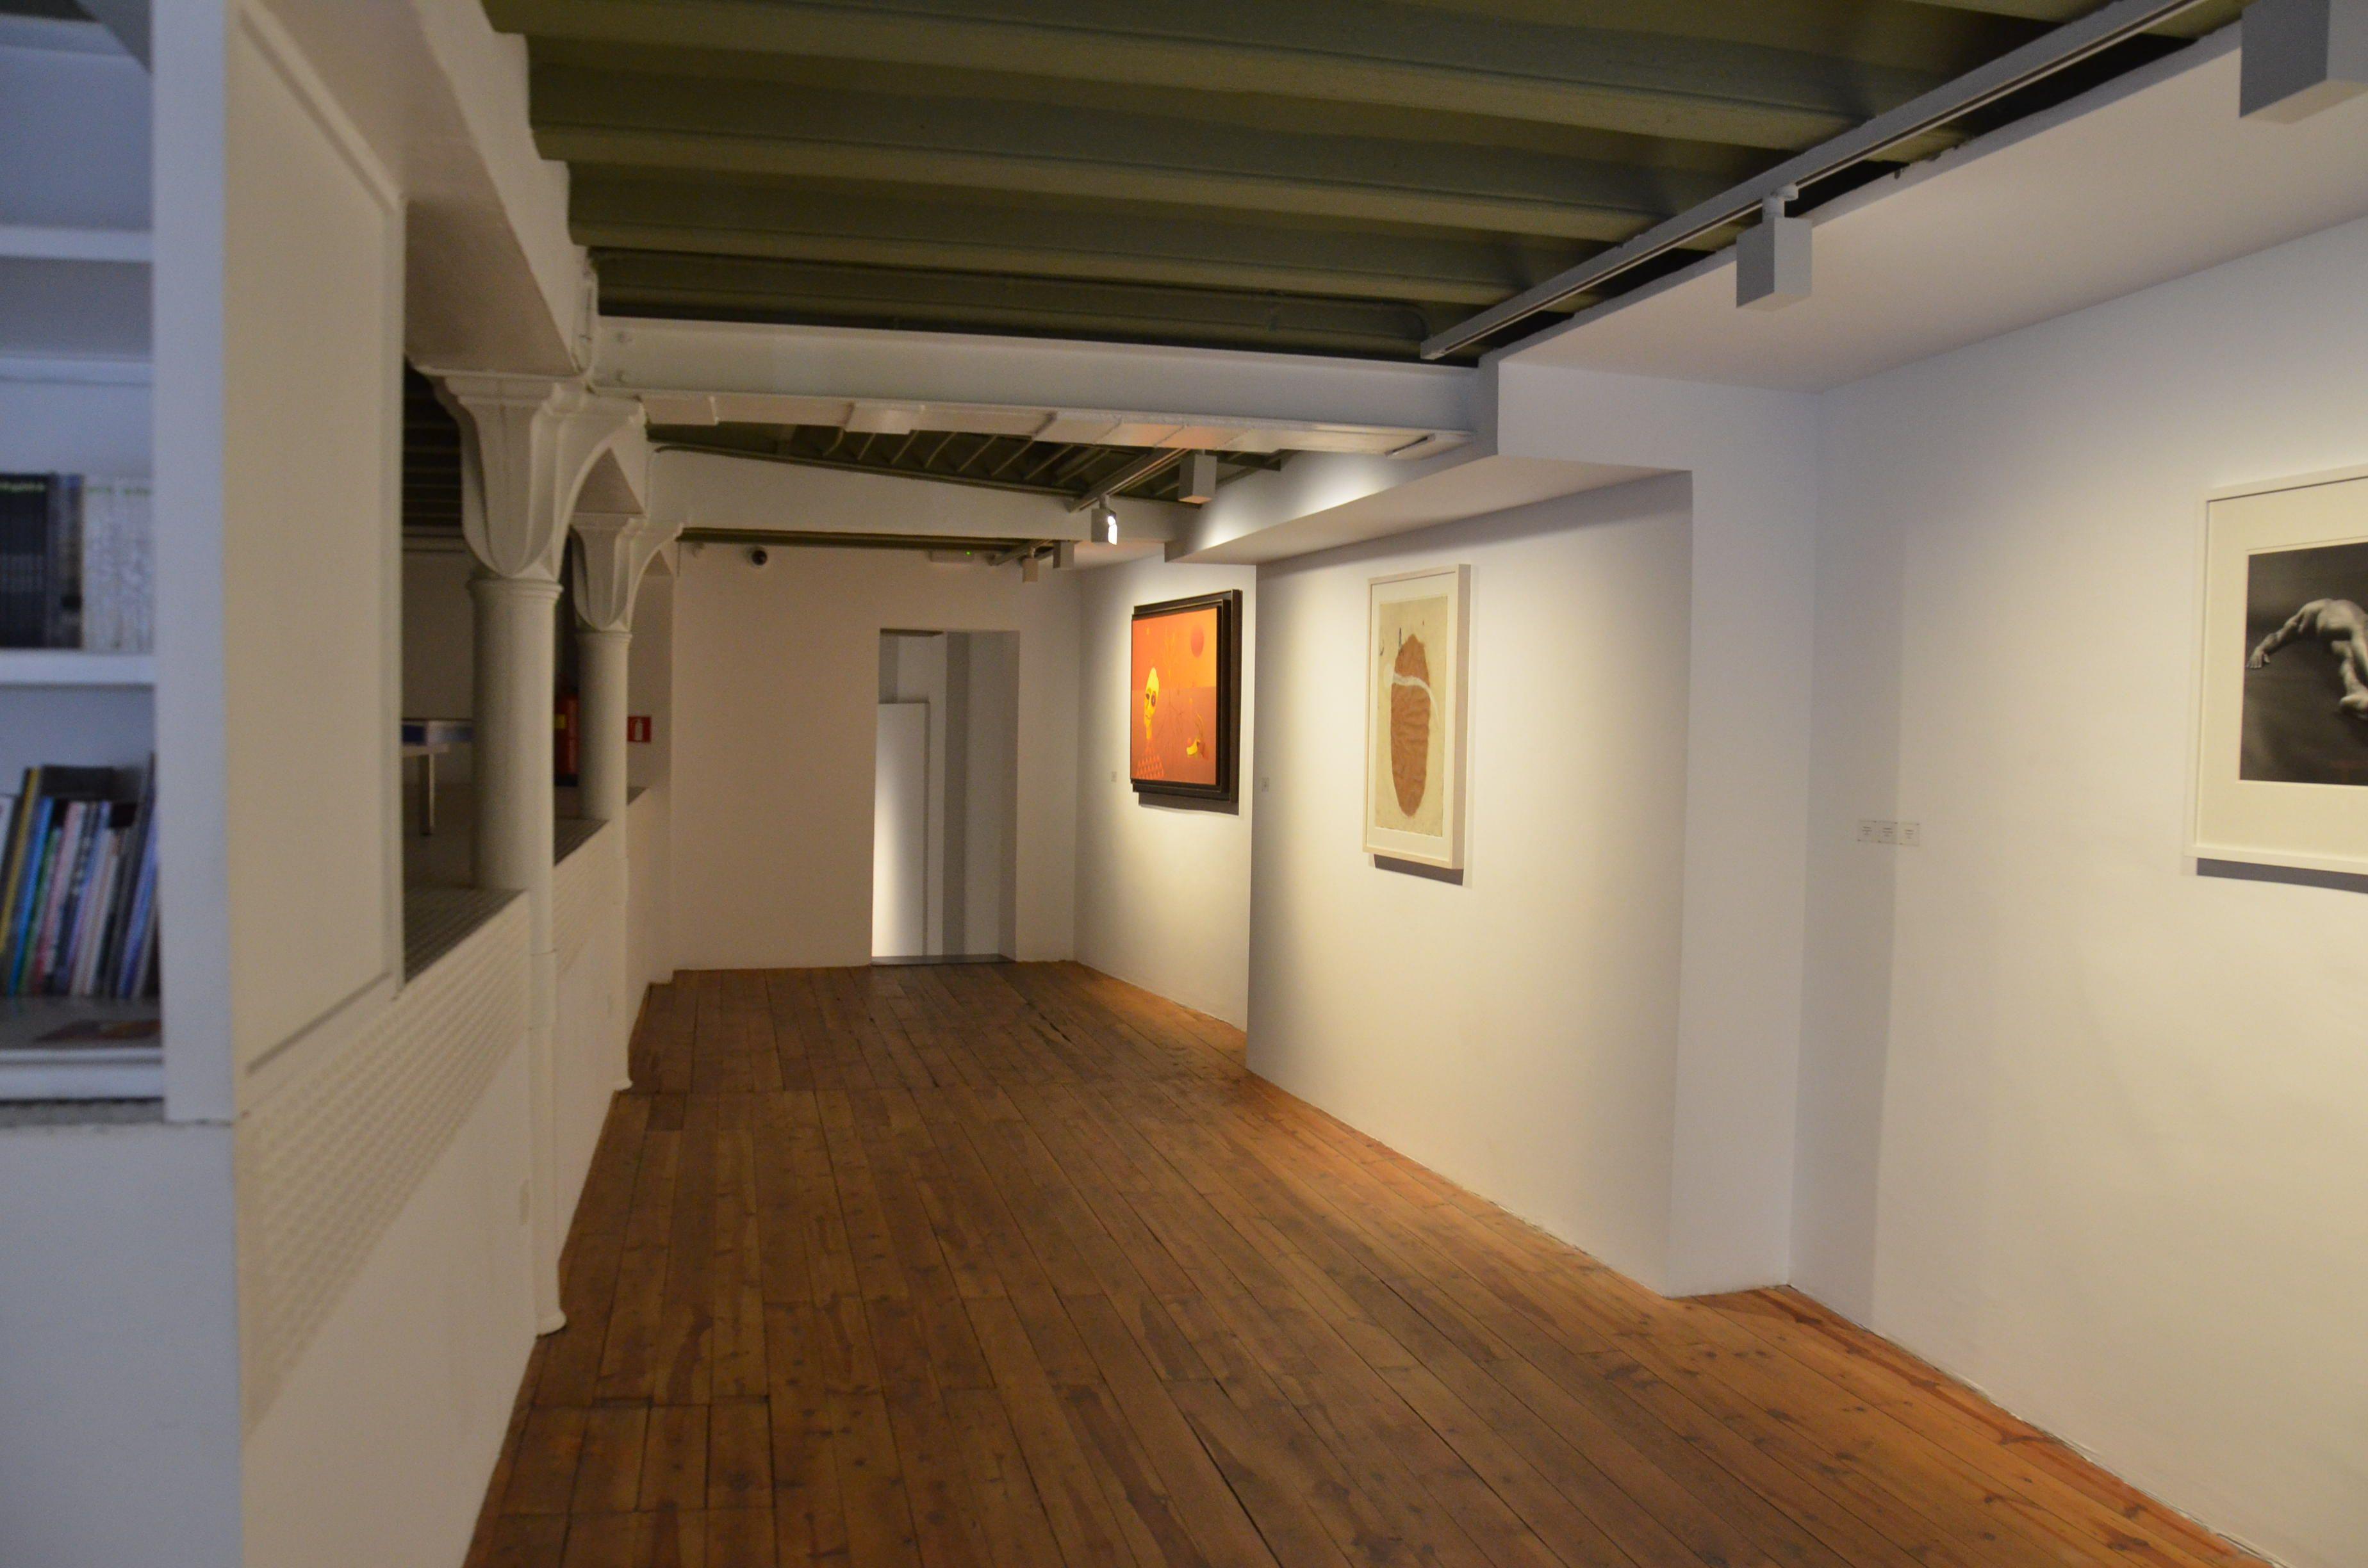 Senda Gallery, Barcelona: All year